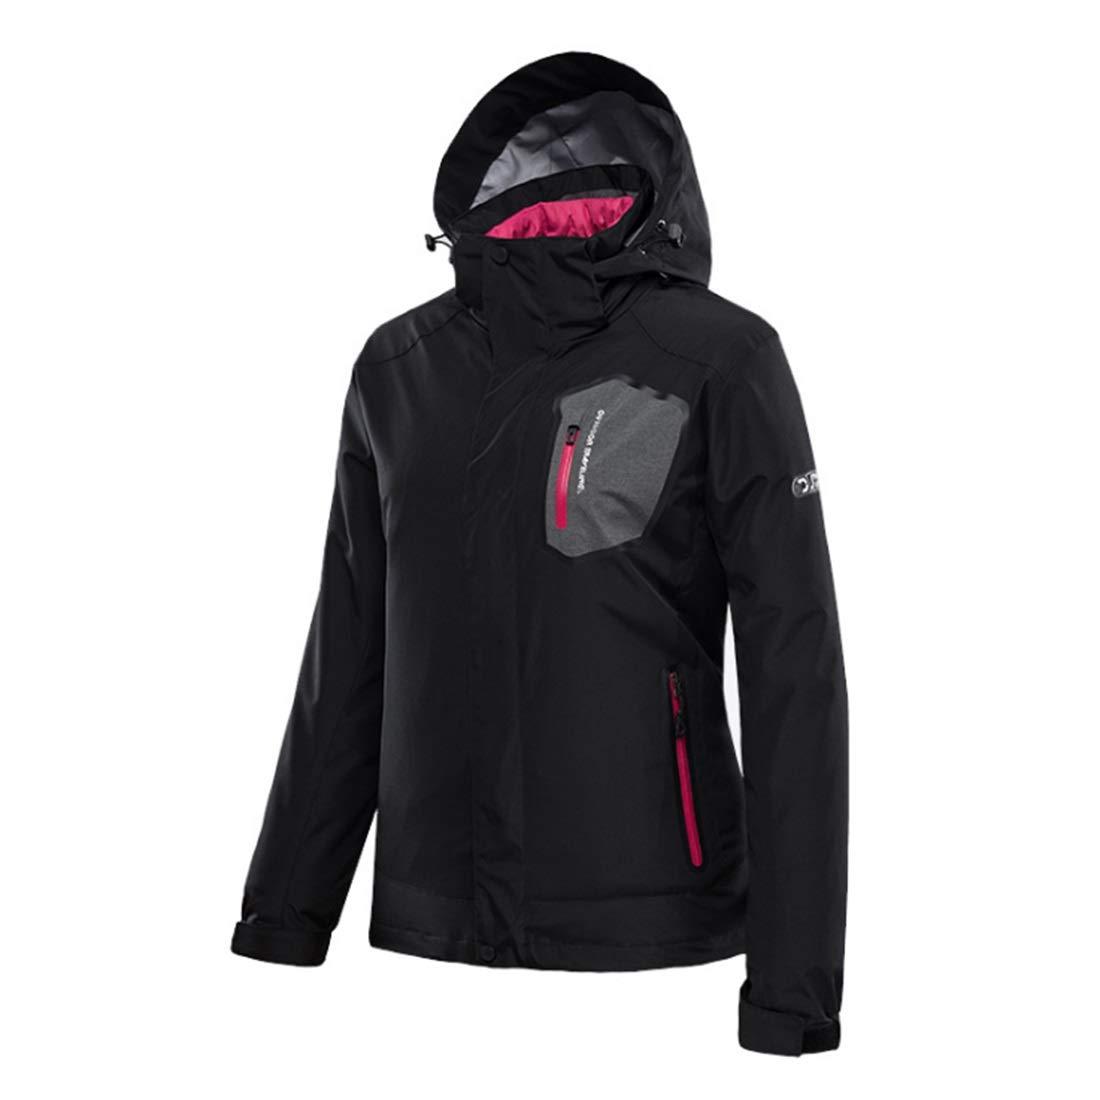 RVINFENDRIYUN YY4 Veste de Ski à Capuchon pour Femmes Winter Mountain Waterproof Windproof Outwear  M